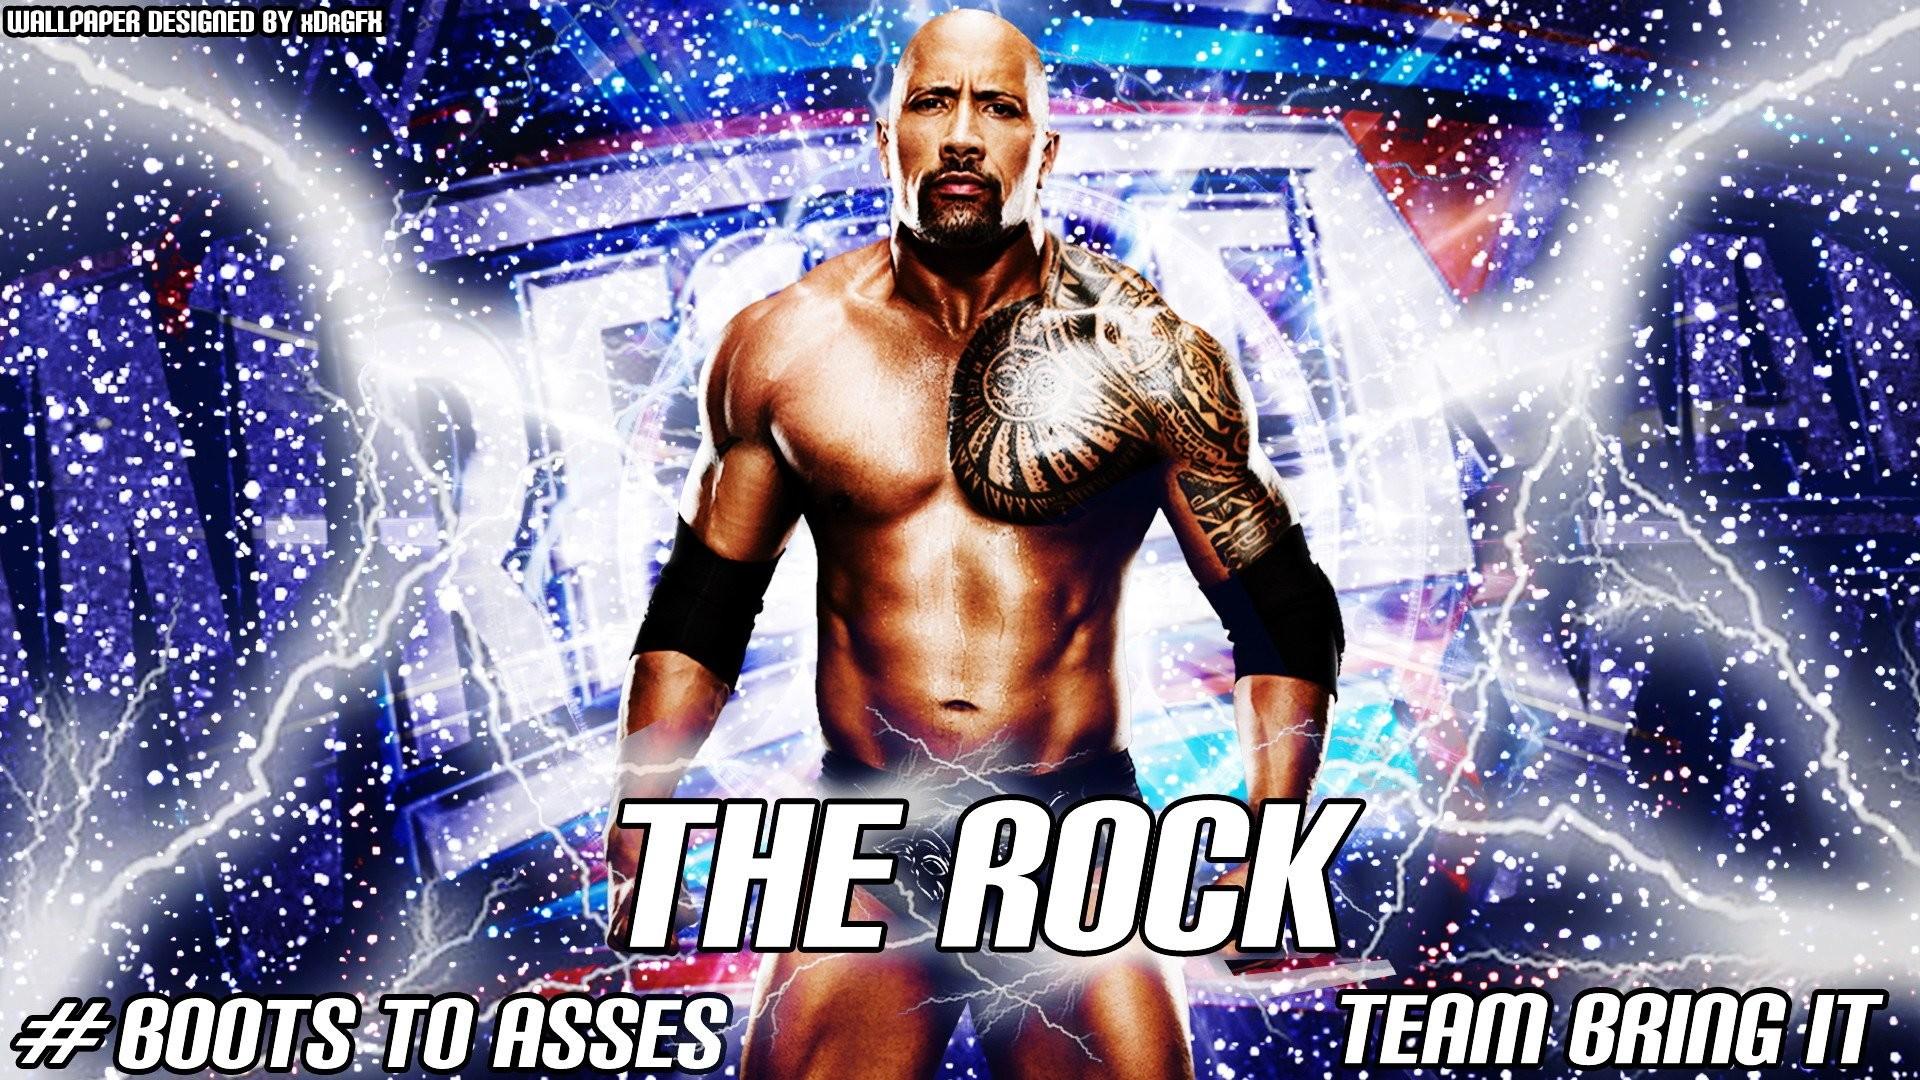 wwe   WWE 1024×768 Wallpaper # 135   AWESOME!   Pinterest   John cena, Wwe  wallpapers and Nxt divas